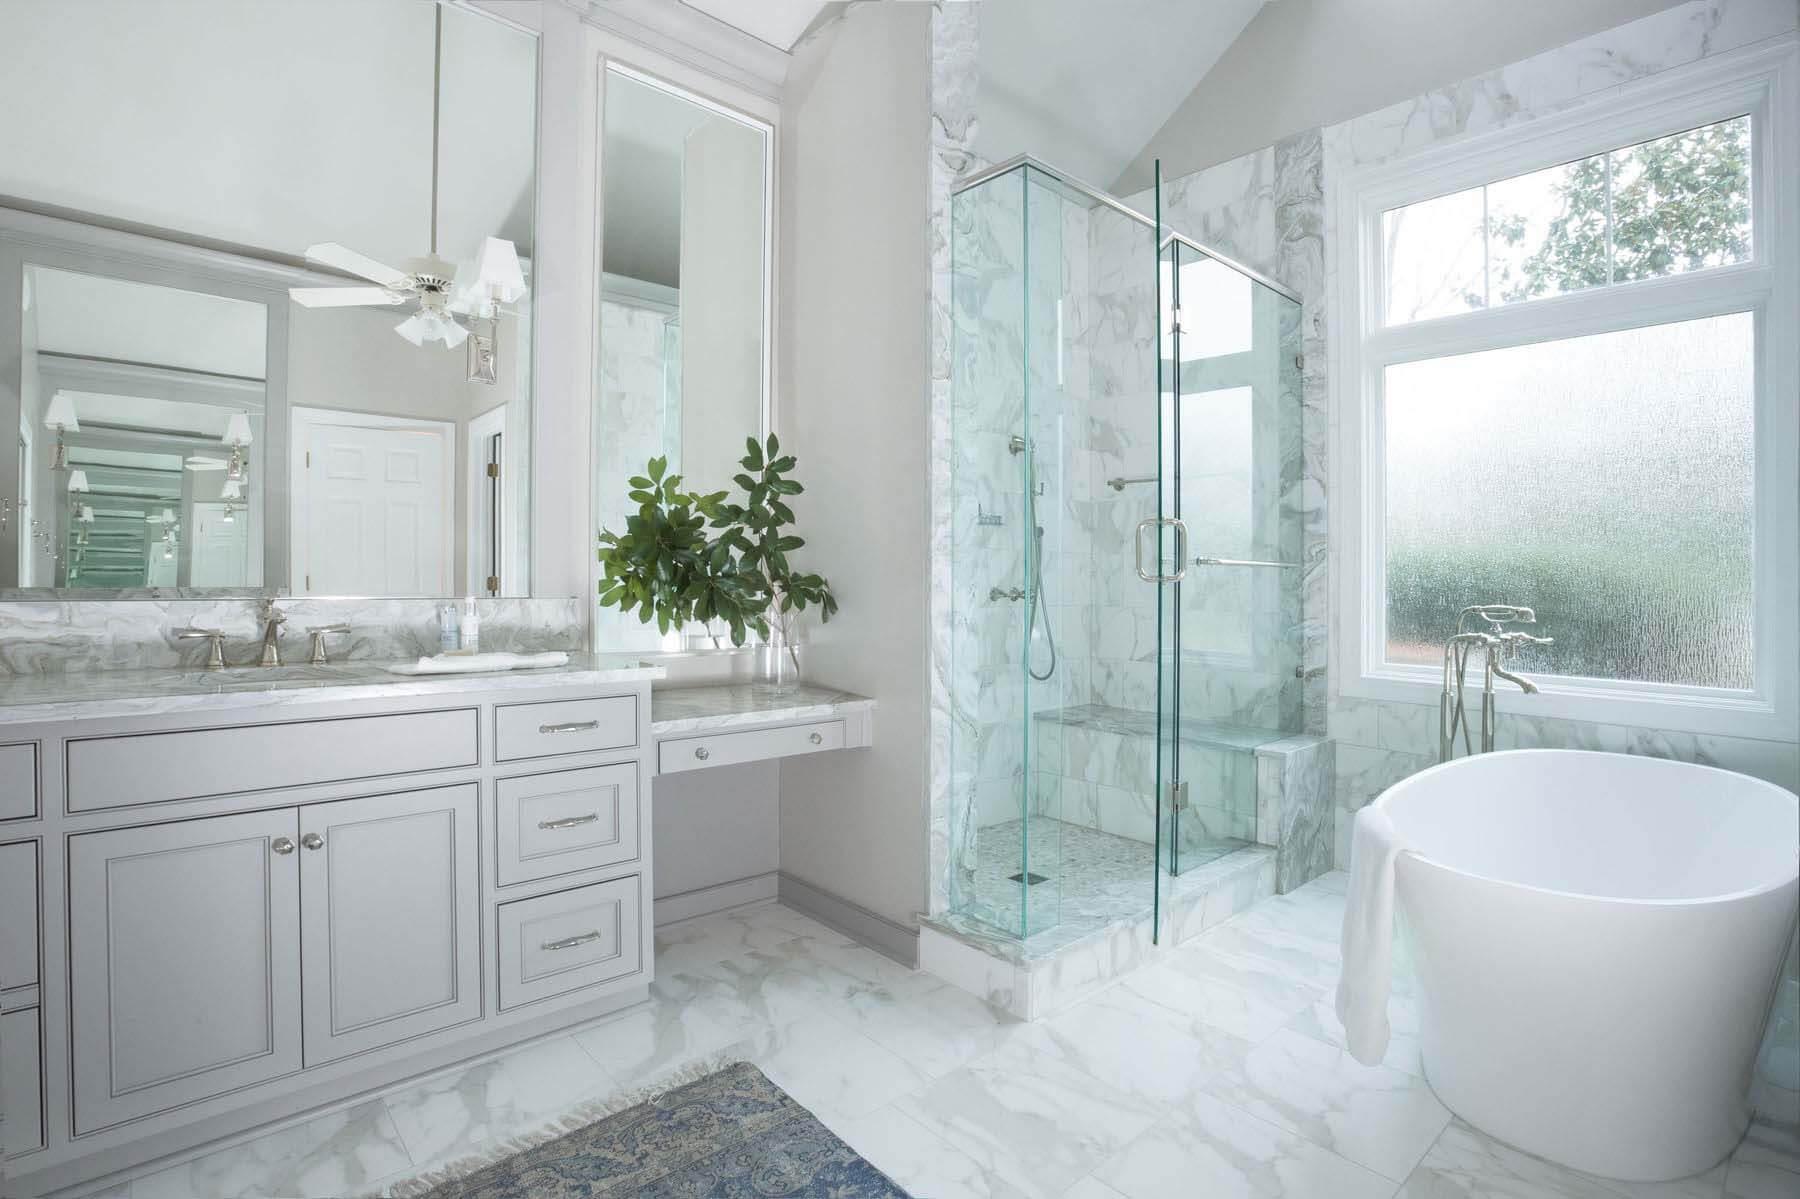 The Secrets of Successful Bathroom Design   StyleBlueprint